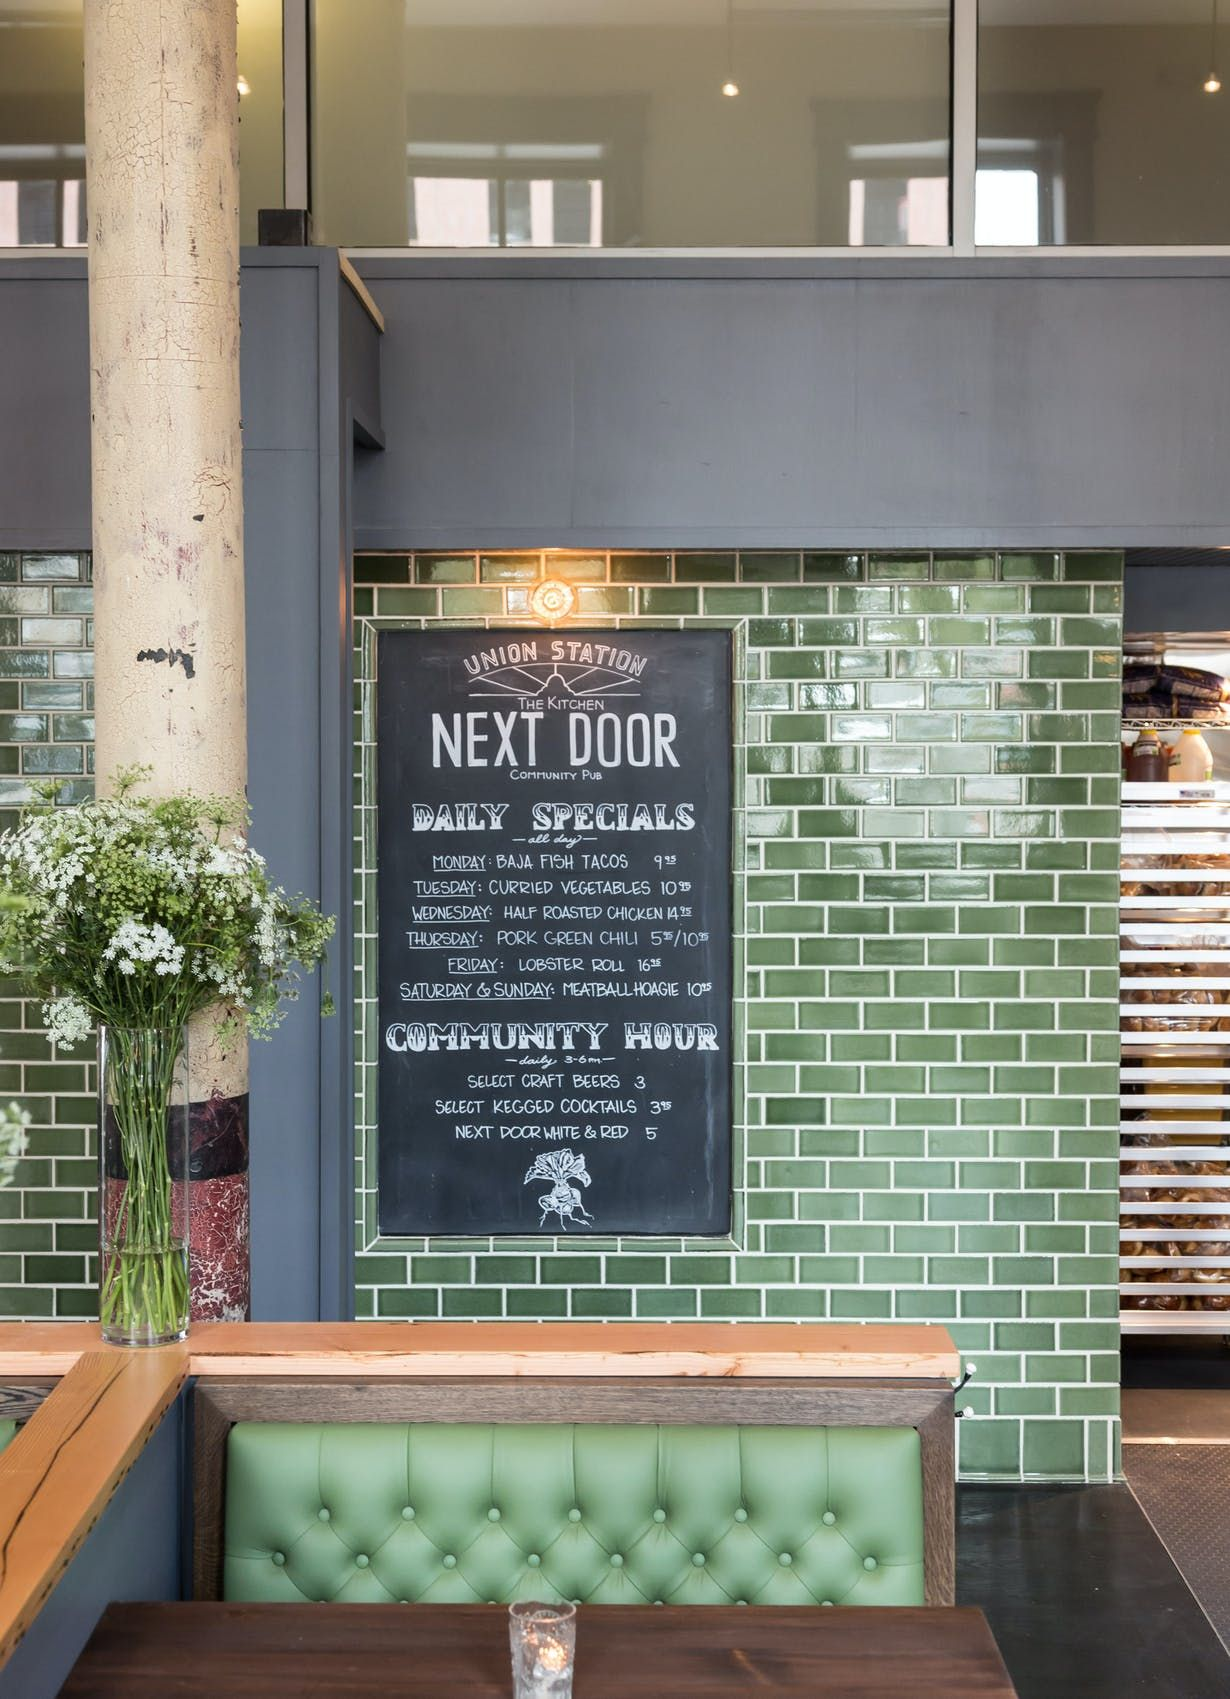 The Kitchen Next Door Union Station Semple Brown Architects Designers Archinect Restaurant Station Coffee Shop Design Restaurant Tiles